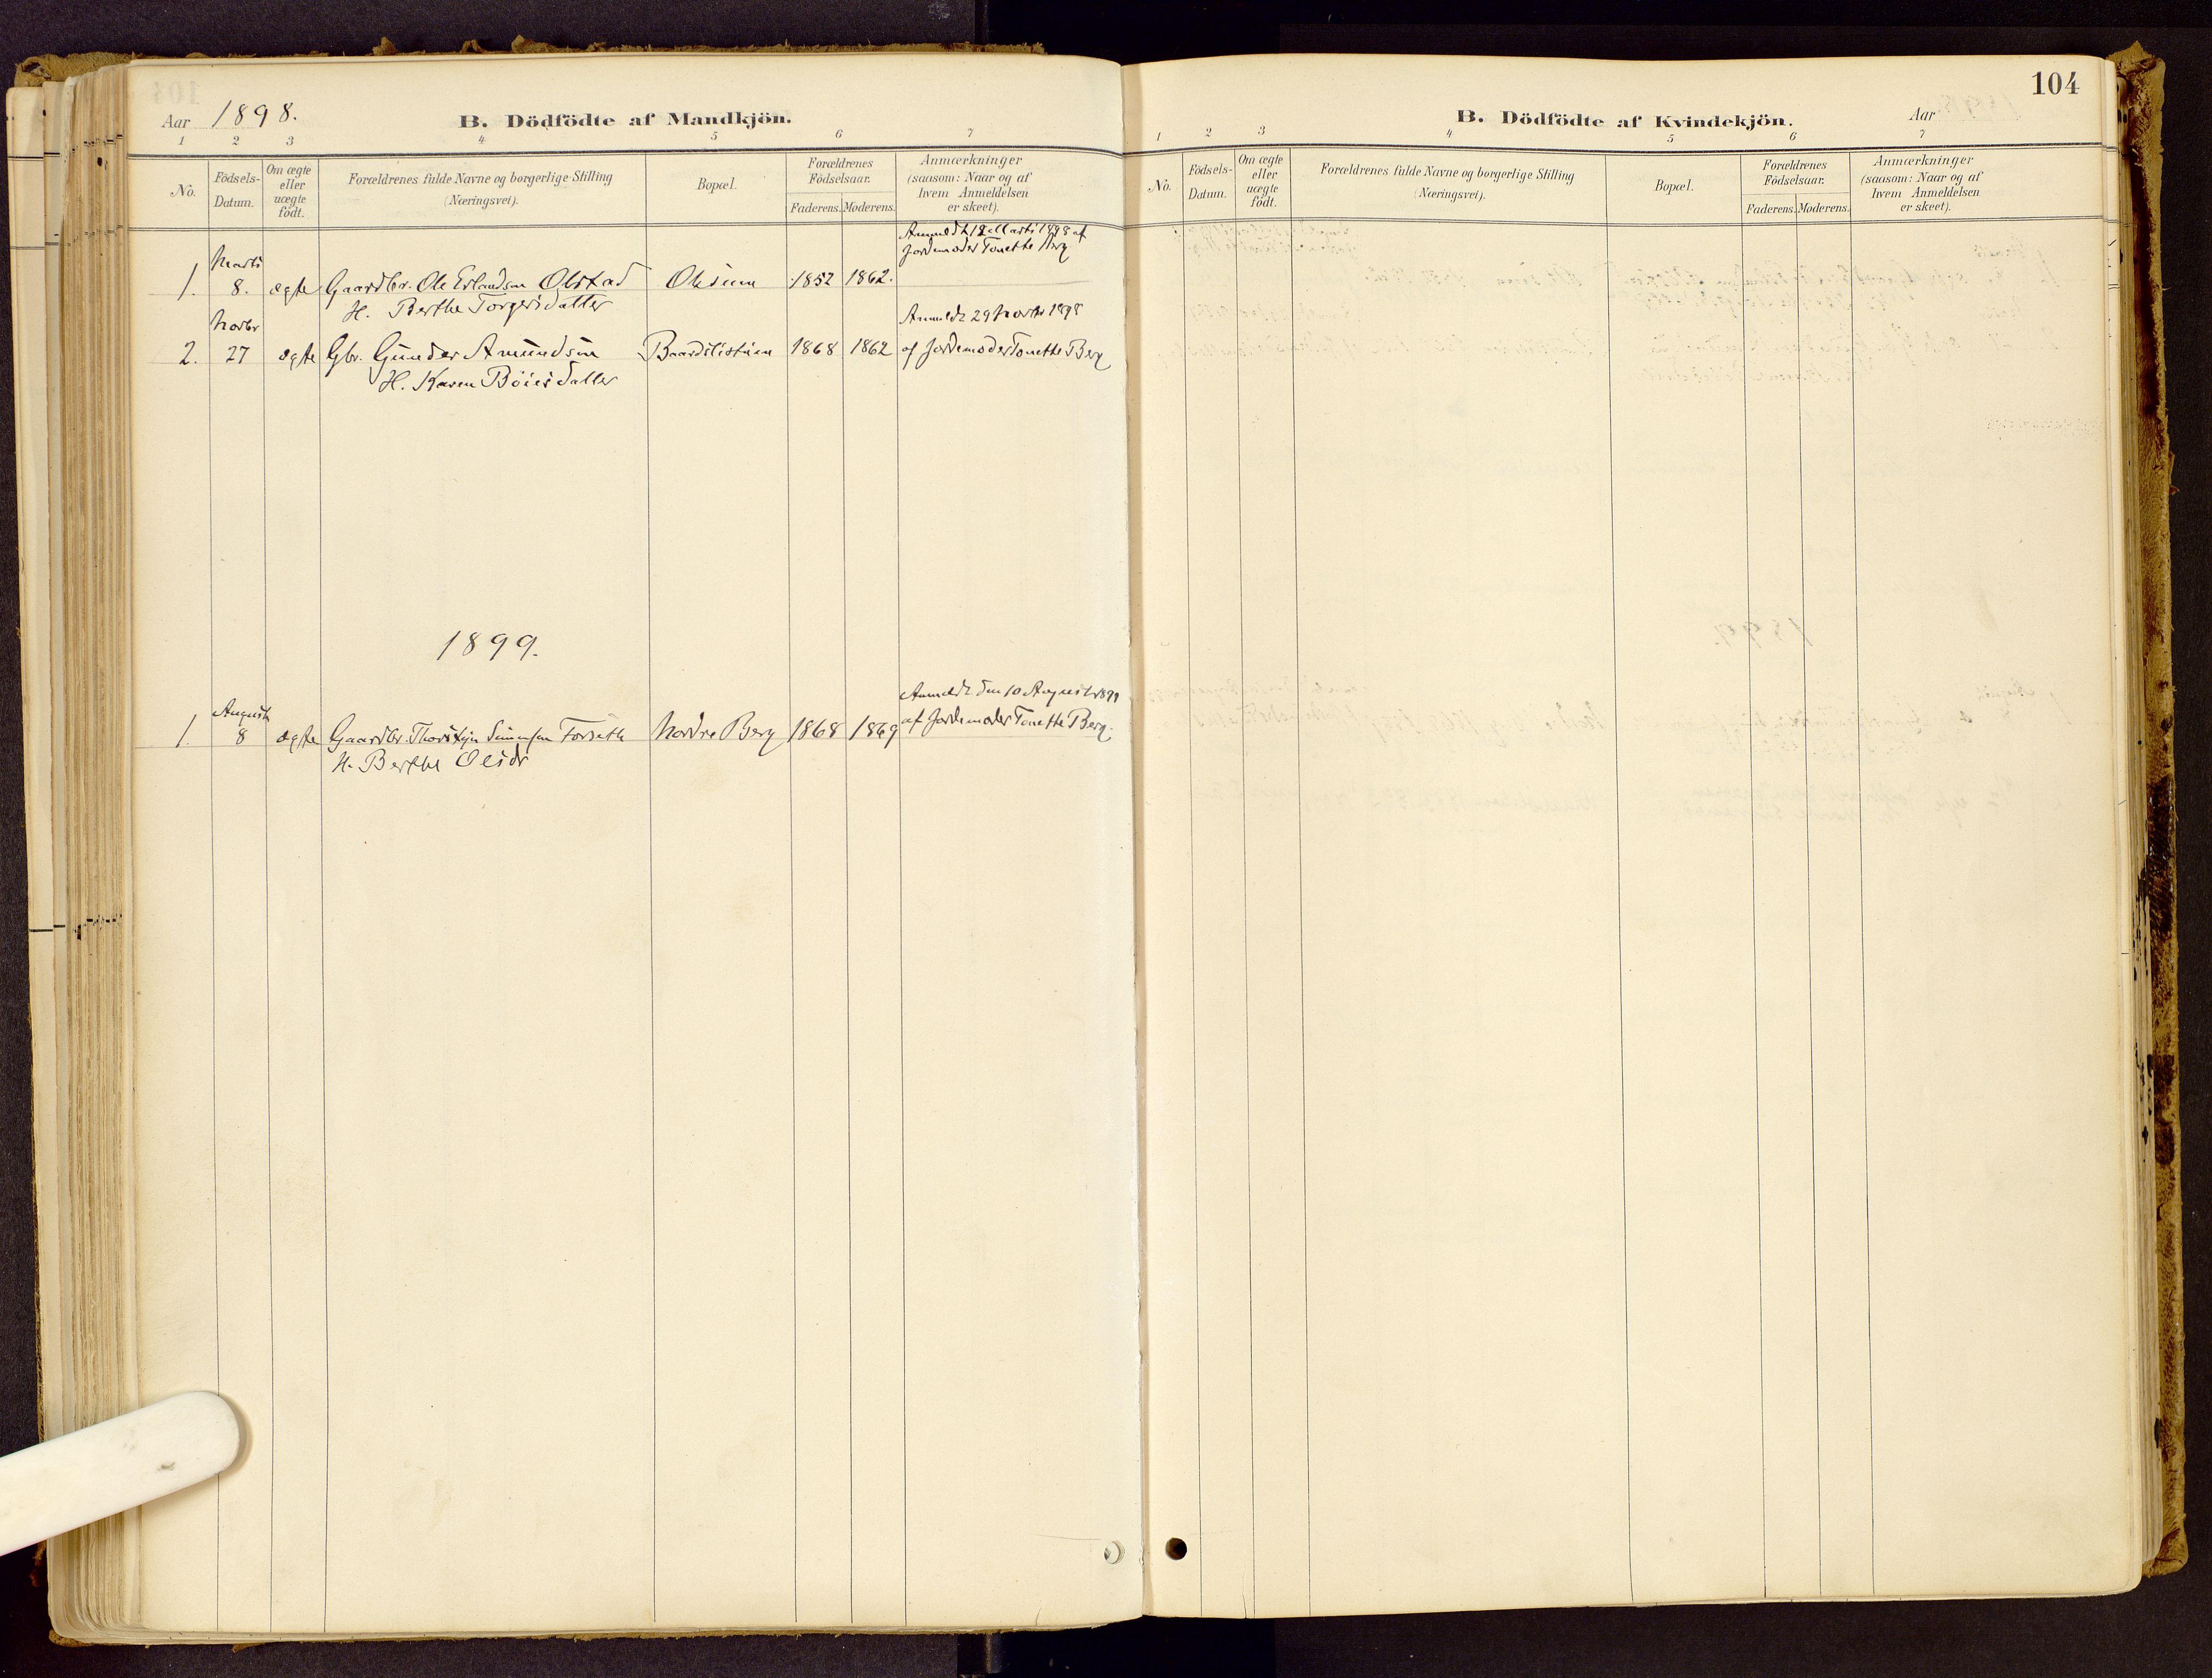 SAH, Vestre Gausdal prestekontor, Ministerialbok nr. 1, 1887-1914, s. 104